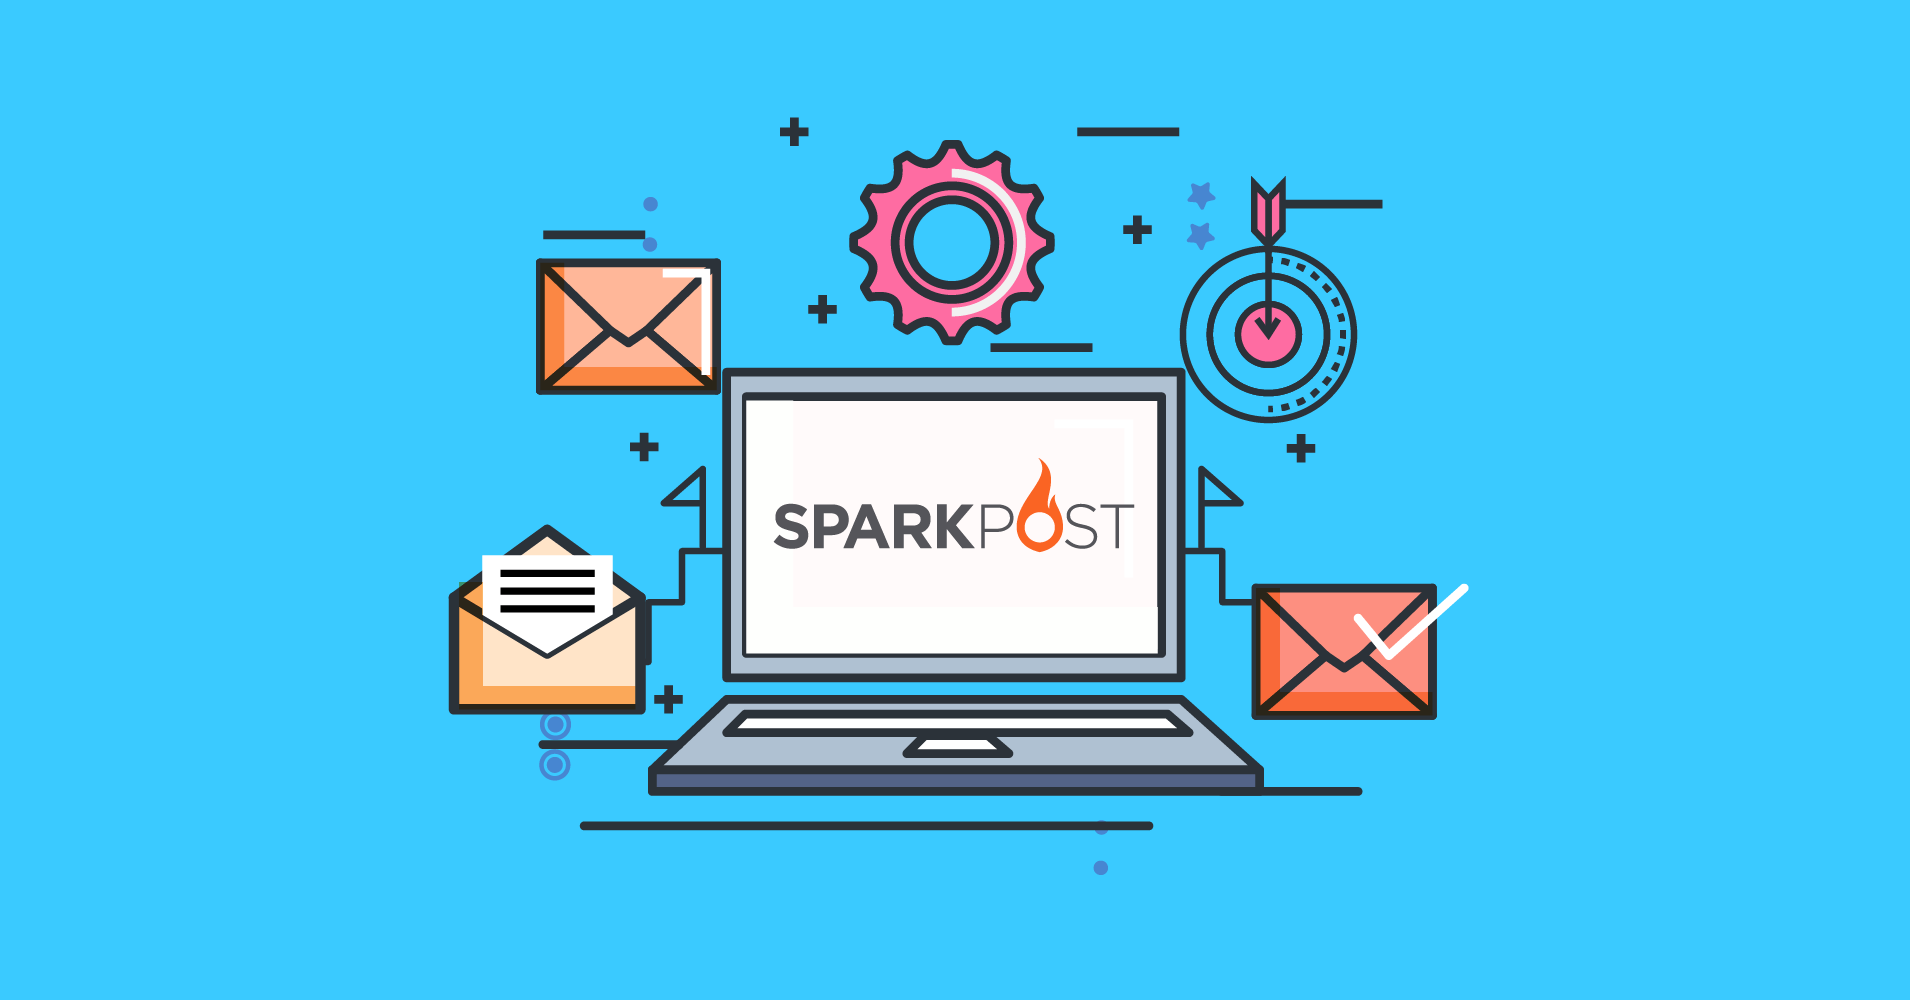 sparkpost wordpress, sparkpost smtp plugin, sparkpost smtp wordpress